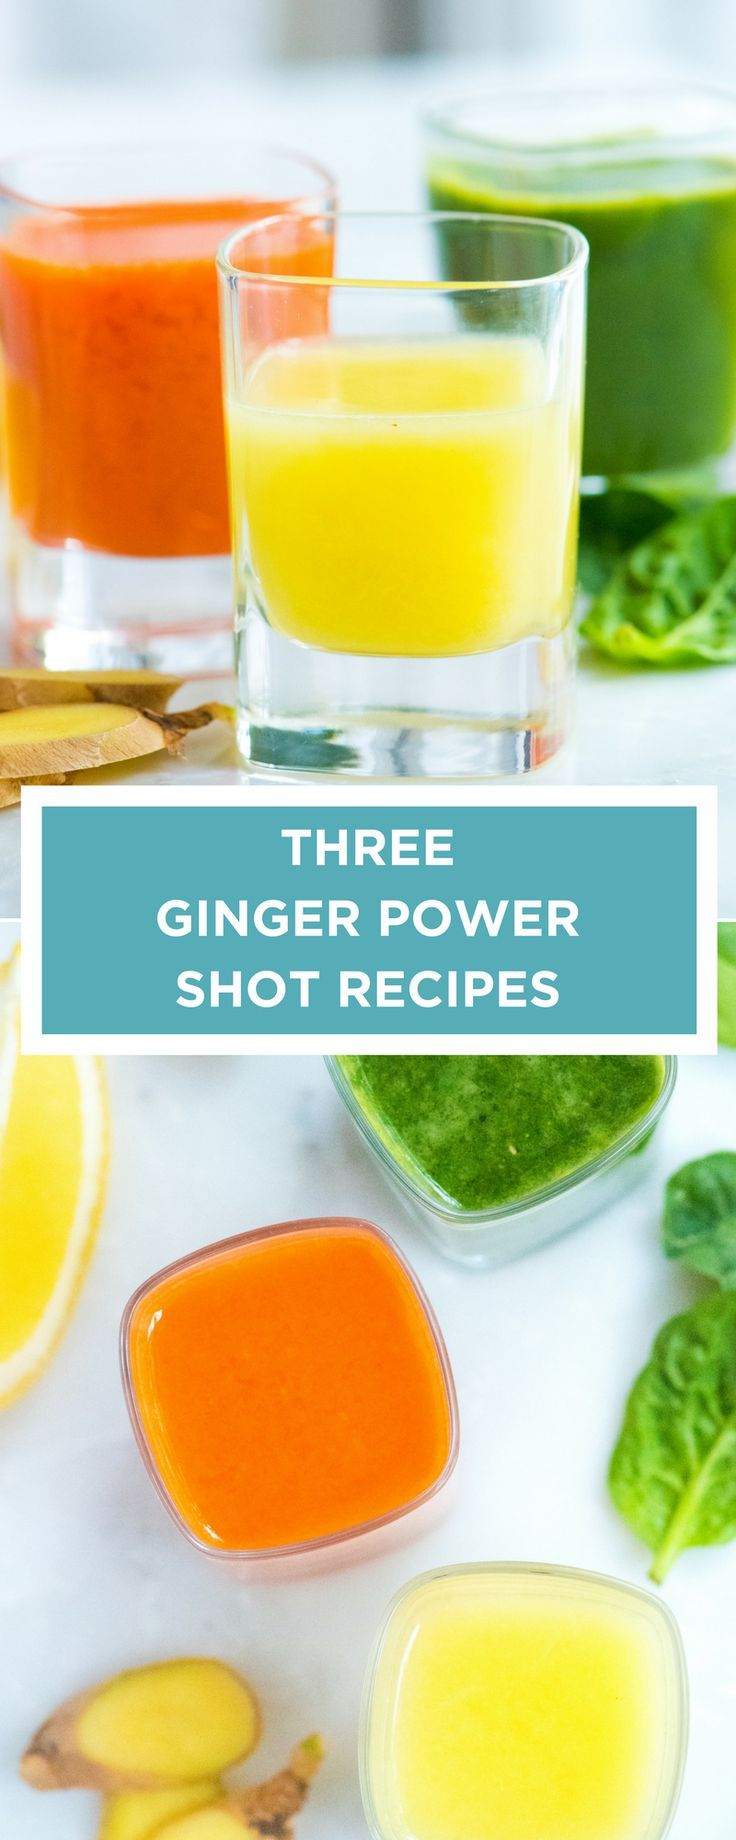 Three Ginger Power Shot Recipes Recipe Ginger shot